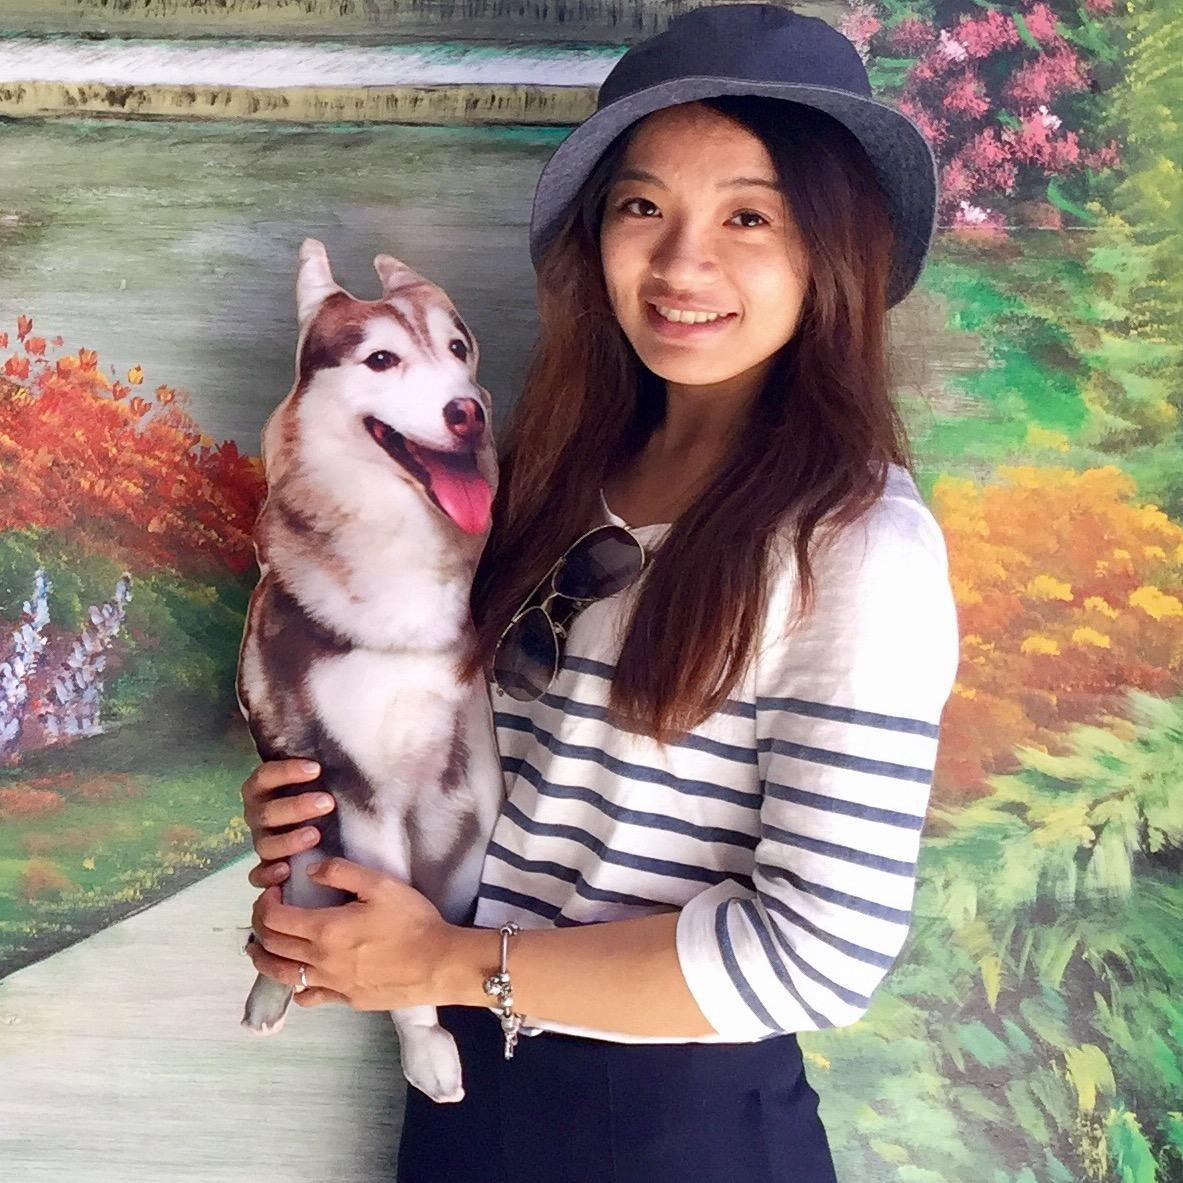 Shao Ling's dog boarding